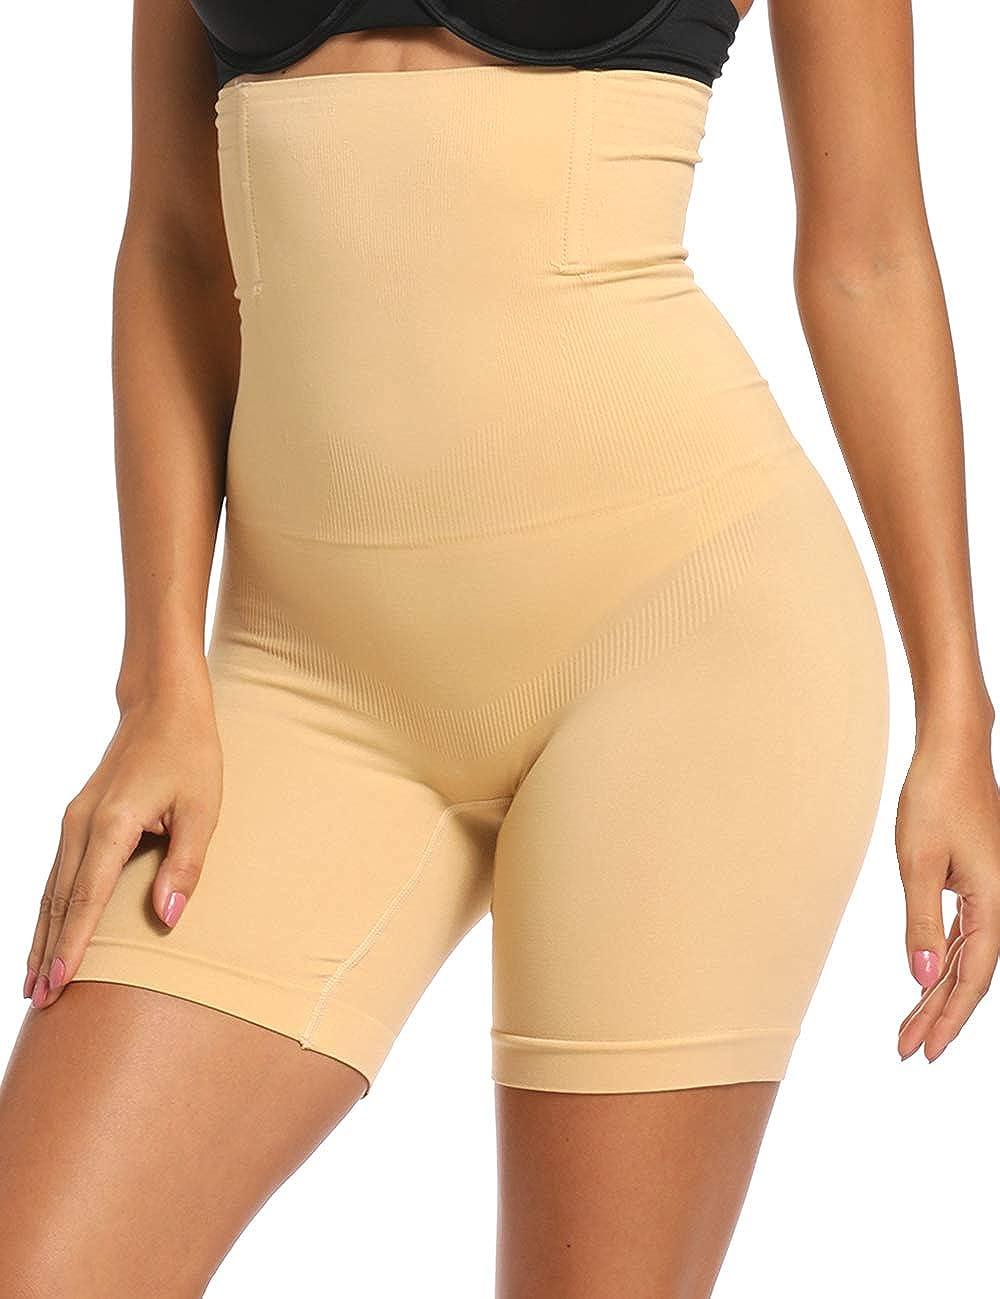 Women Waist Trainer Shapewear Shorts High Waisted Strapless Body Shaper Thigh Slimmer Panties Tummy Control Underwear